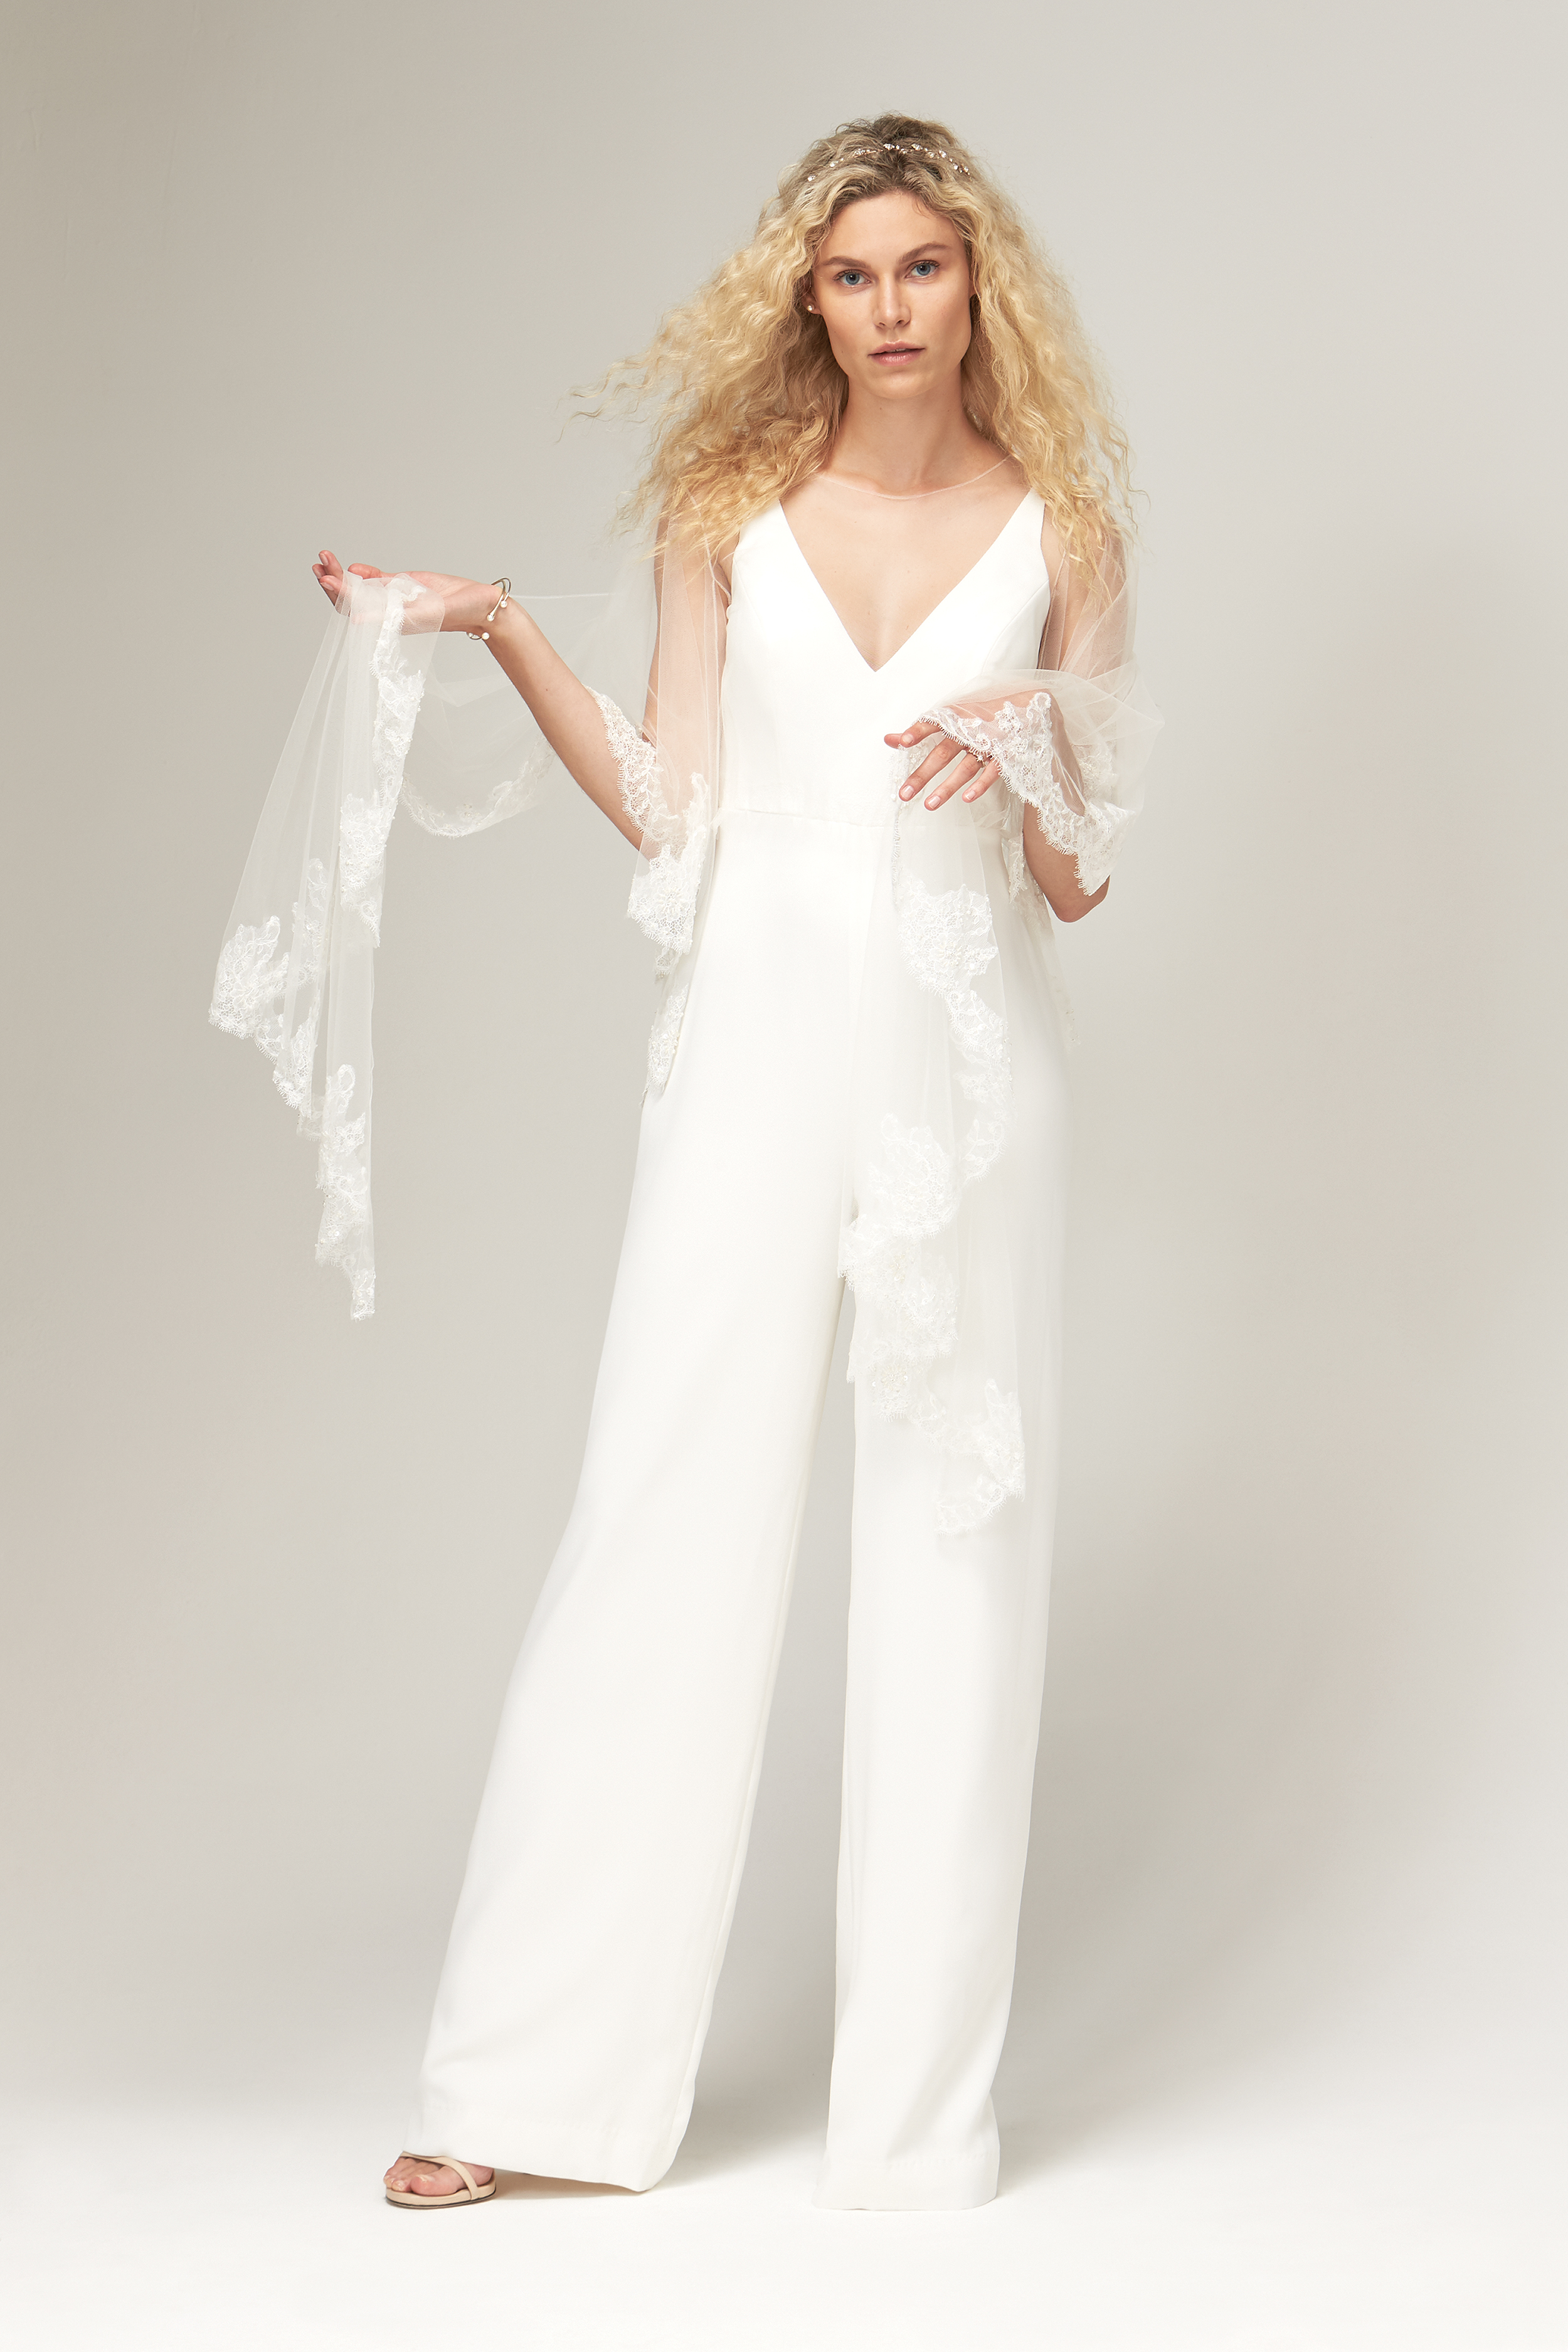 savannah miller fall 2019 jumpsuit v neck sleeveless sheer lace shawl